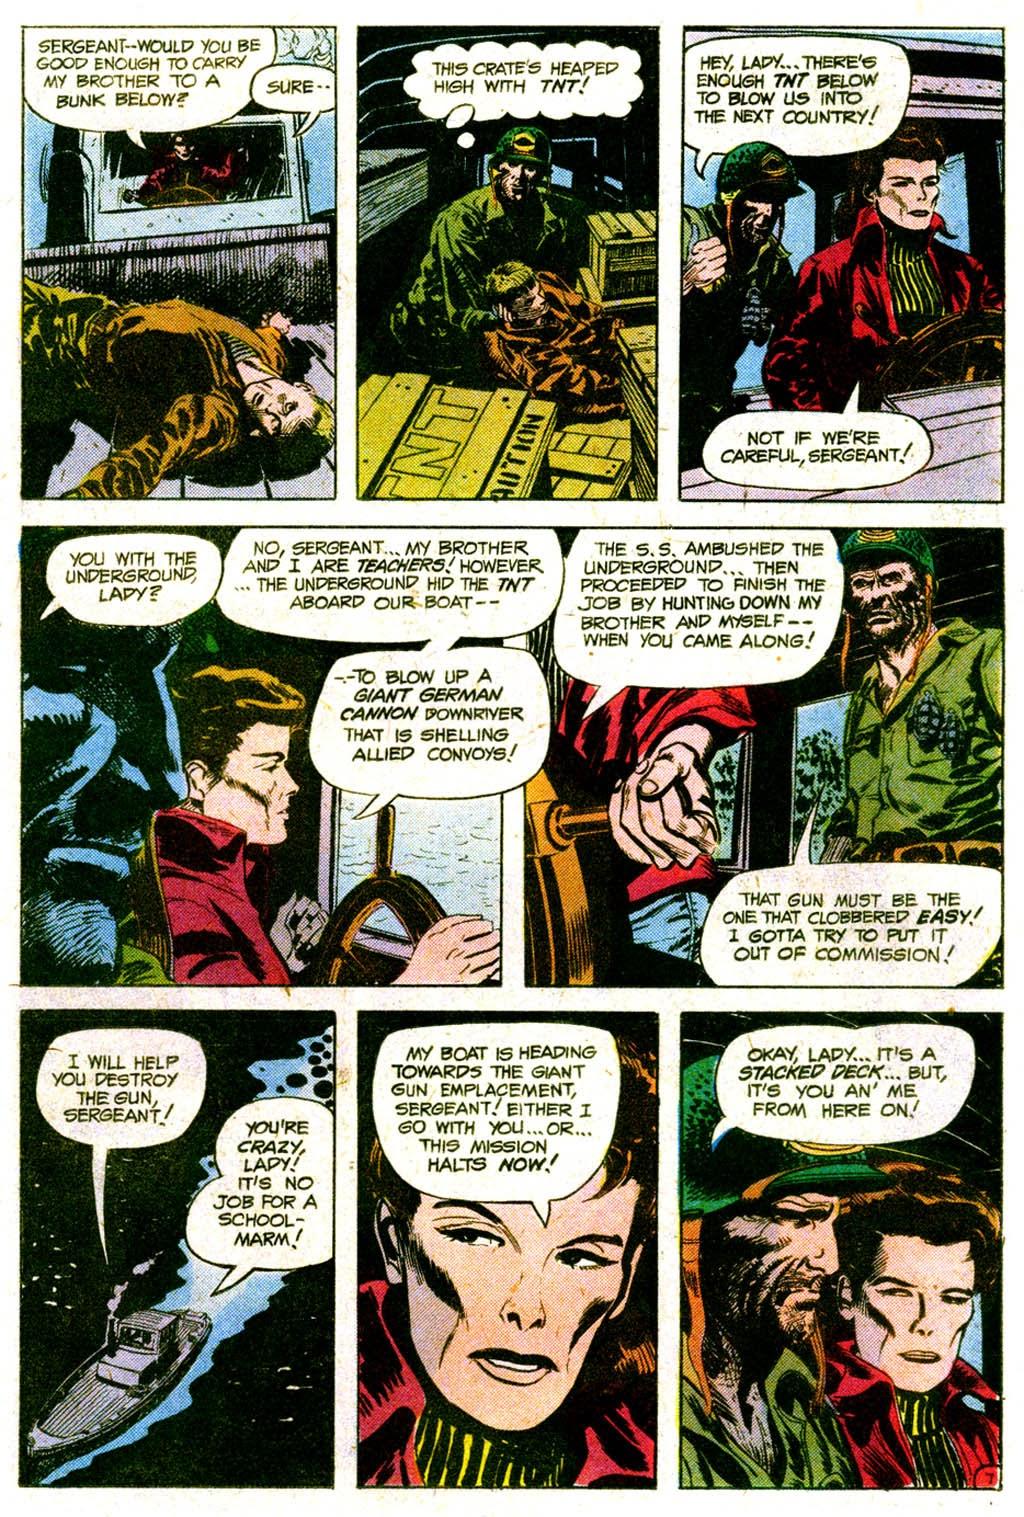 Read online Sgt. Rock comic -  Issue #311 - 10